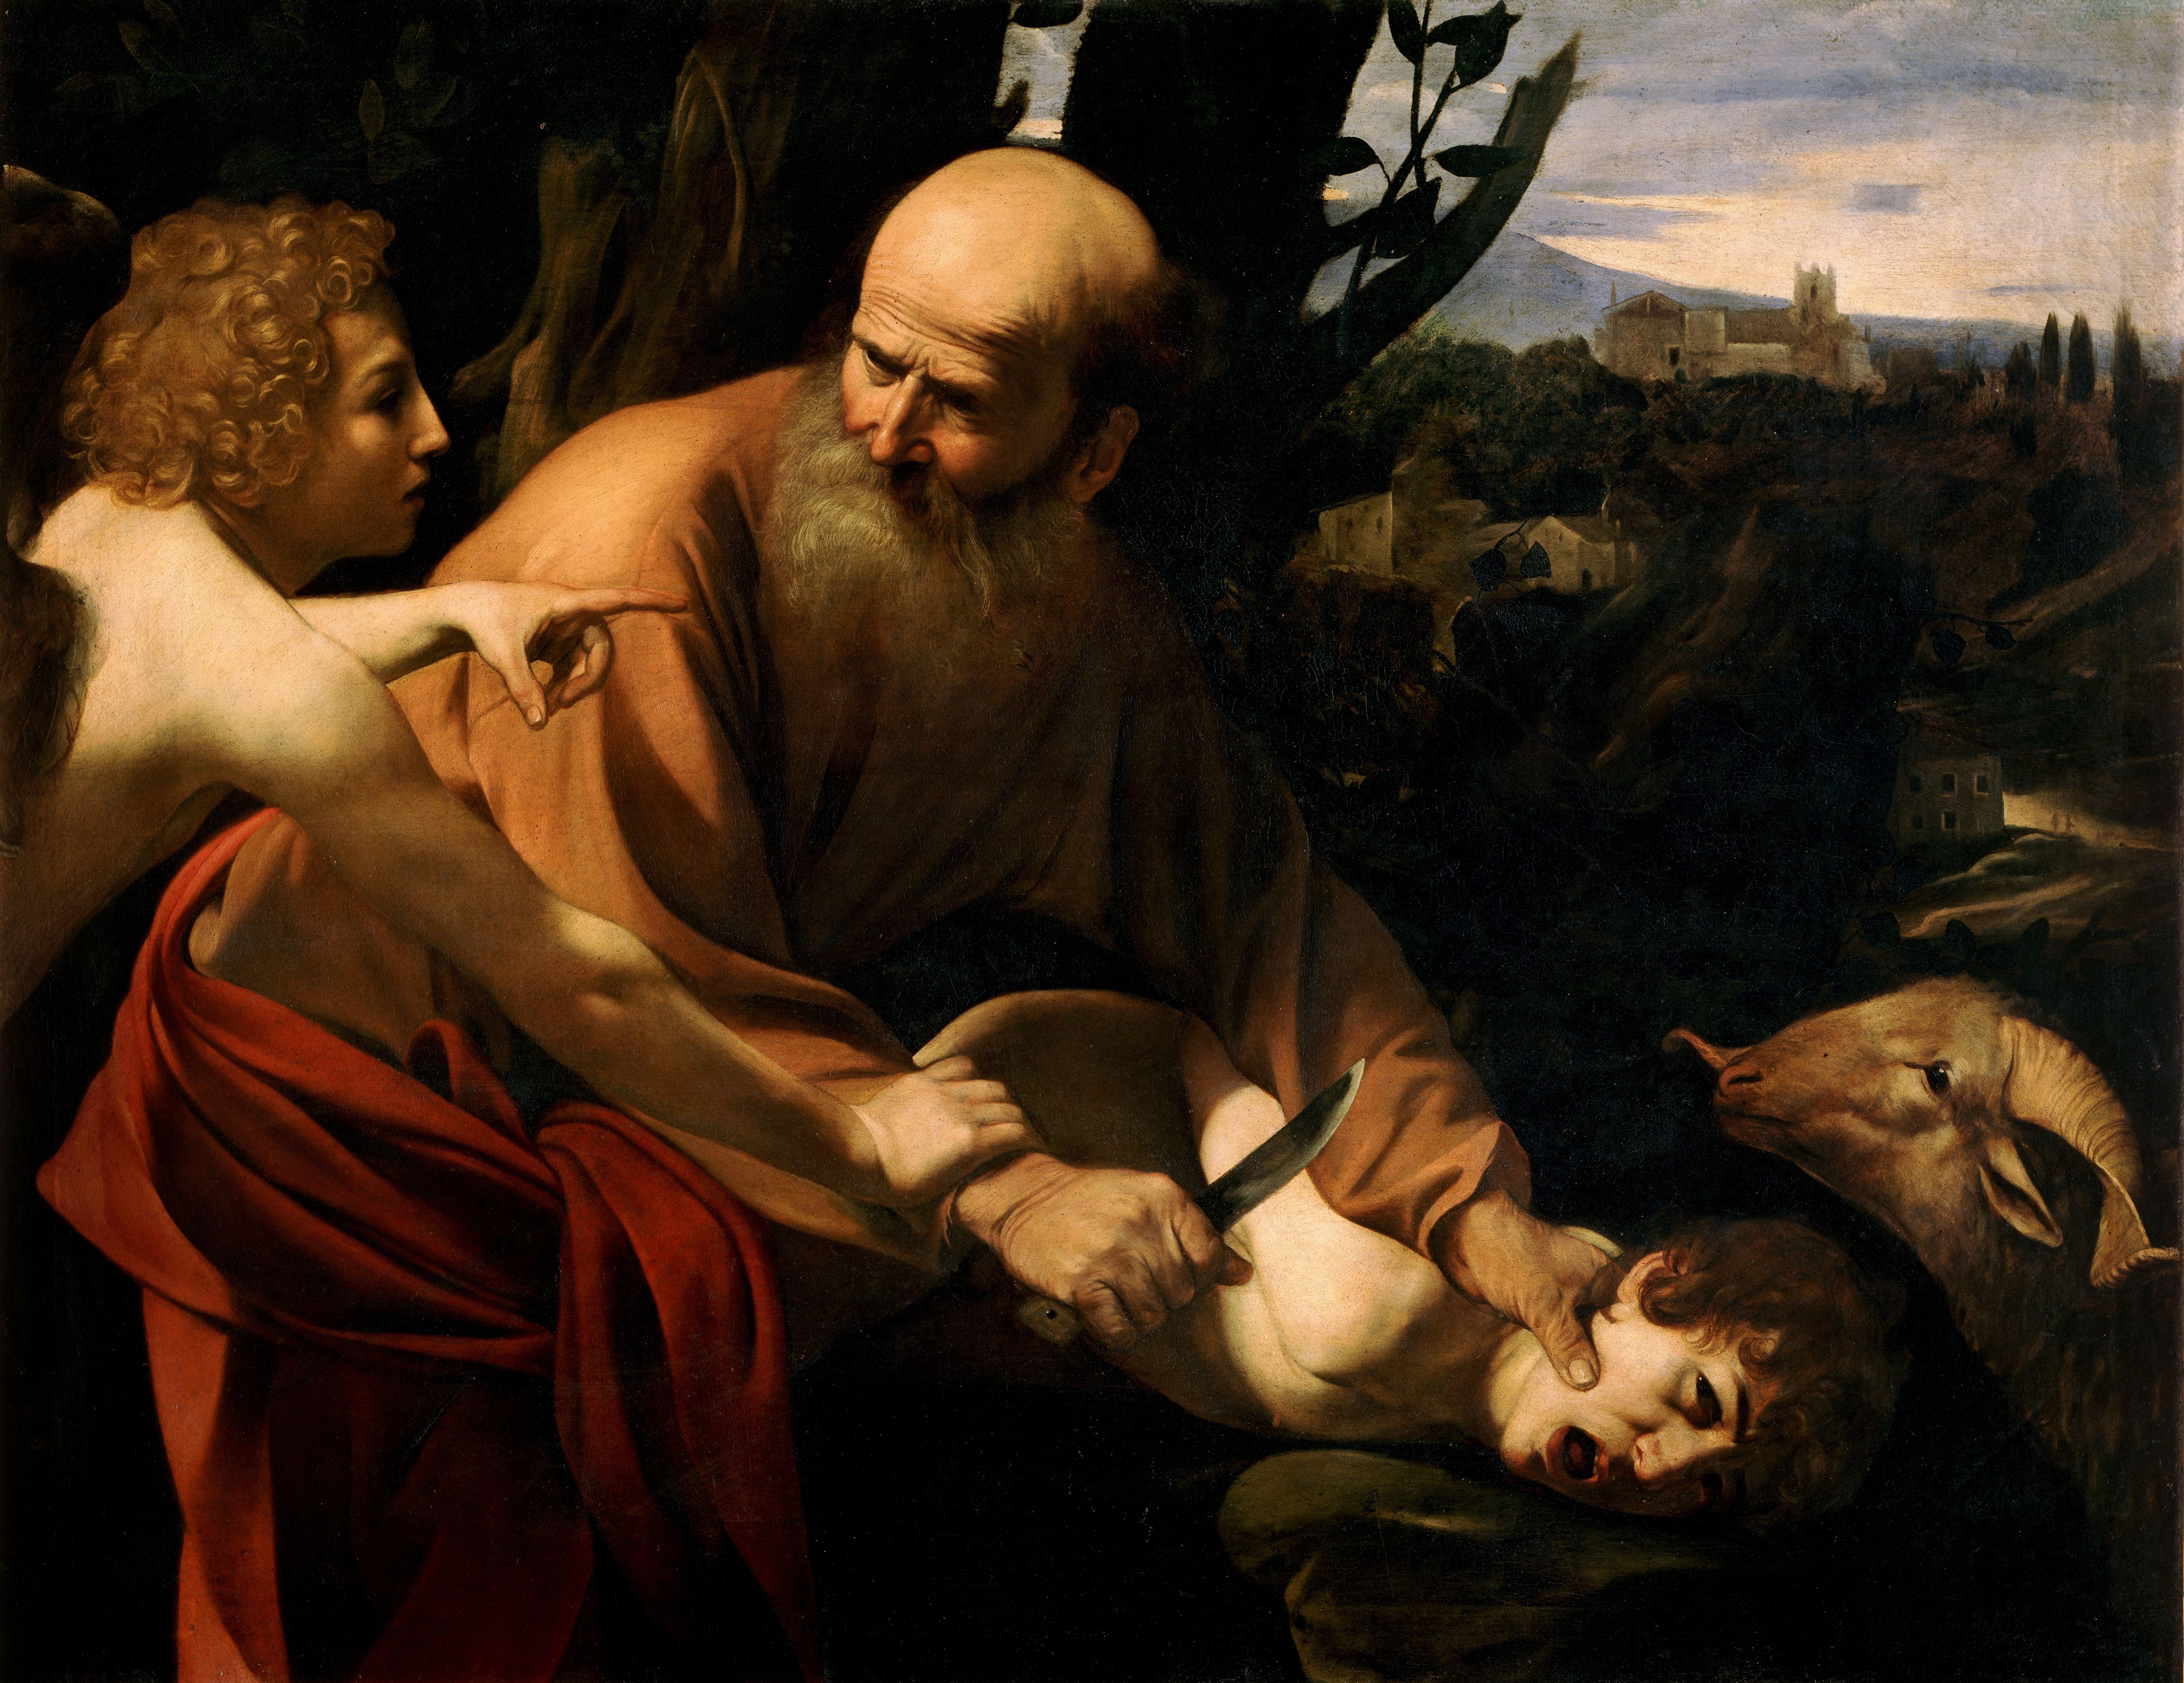 Sacrifice_of_Isaac-Caravaggio_(Uffizi).jpg